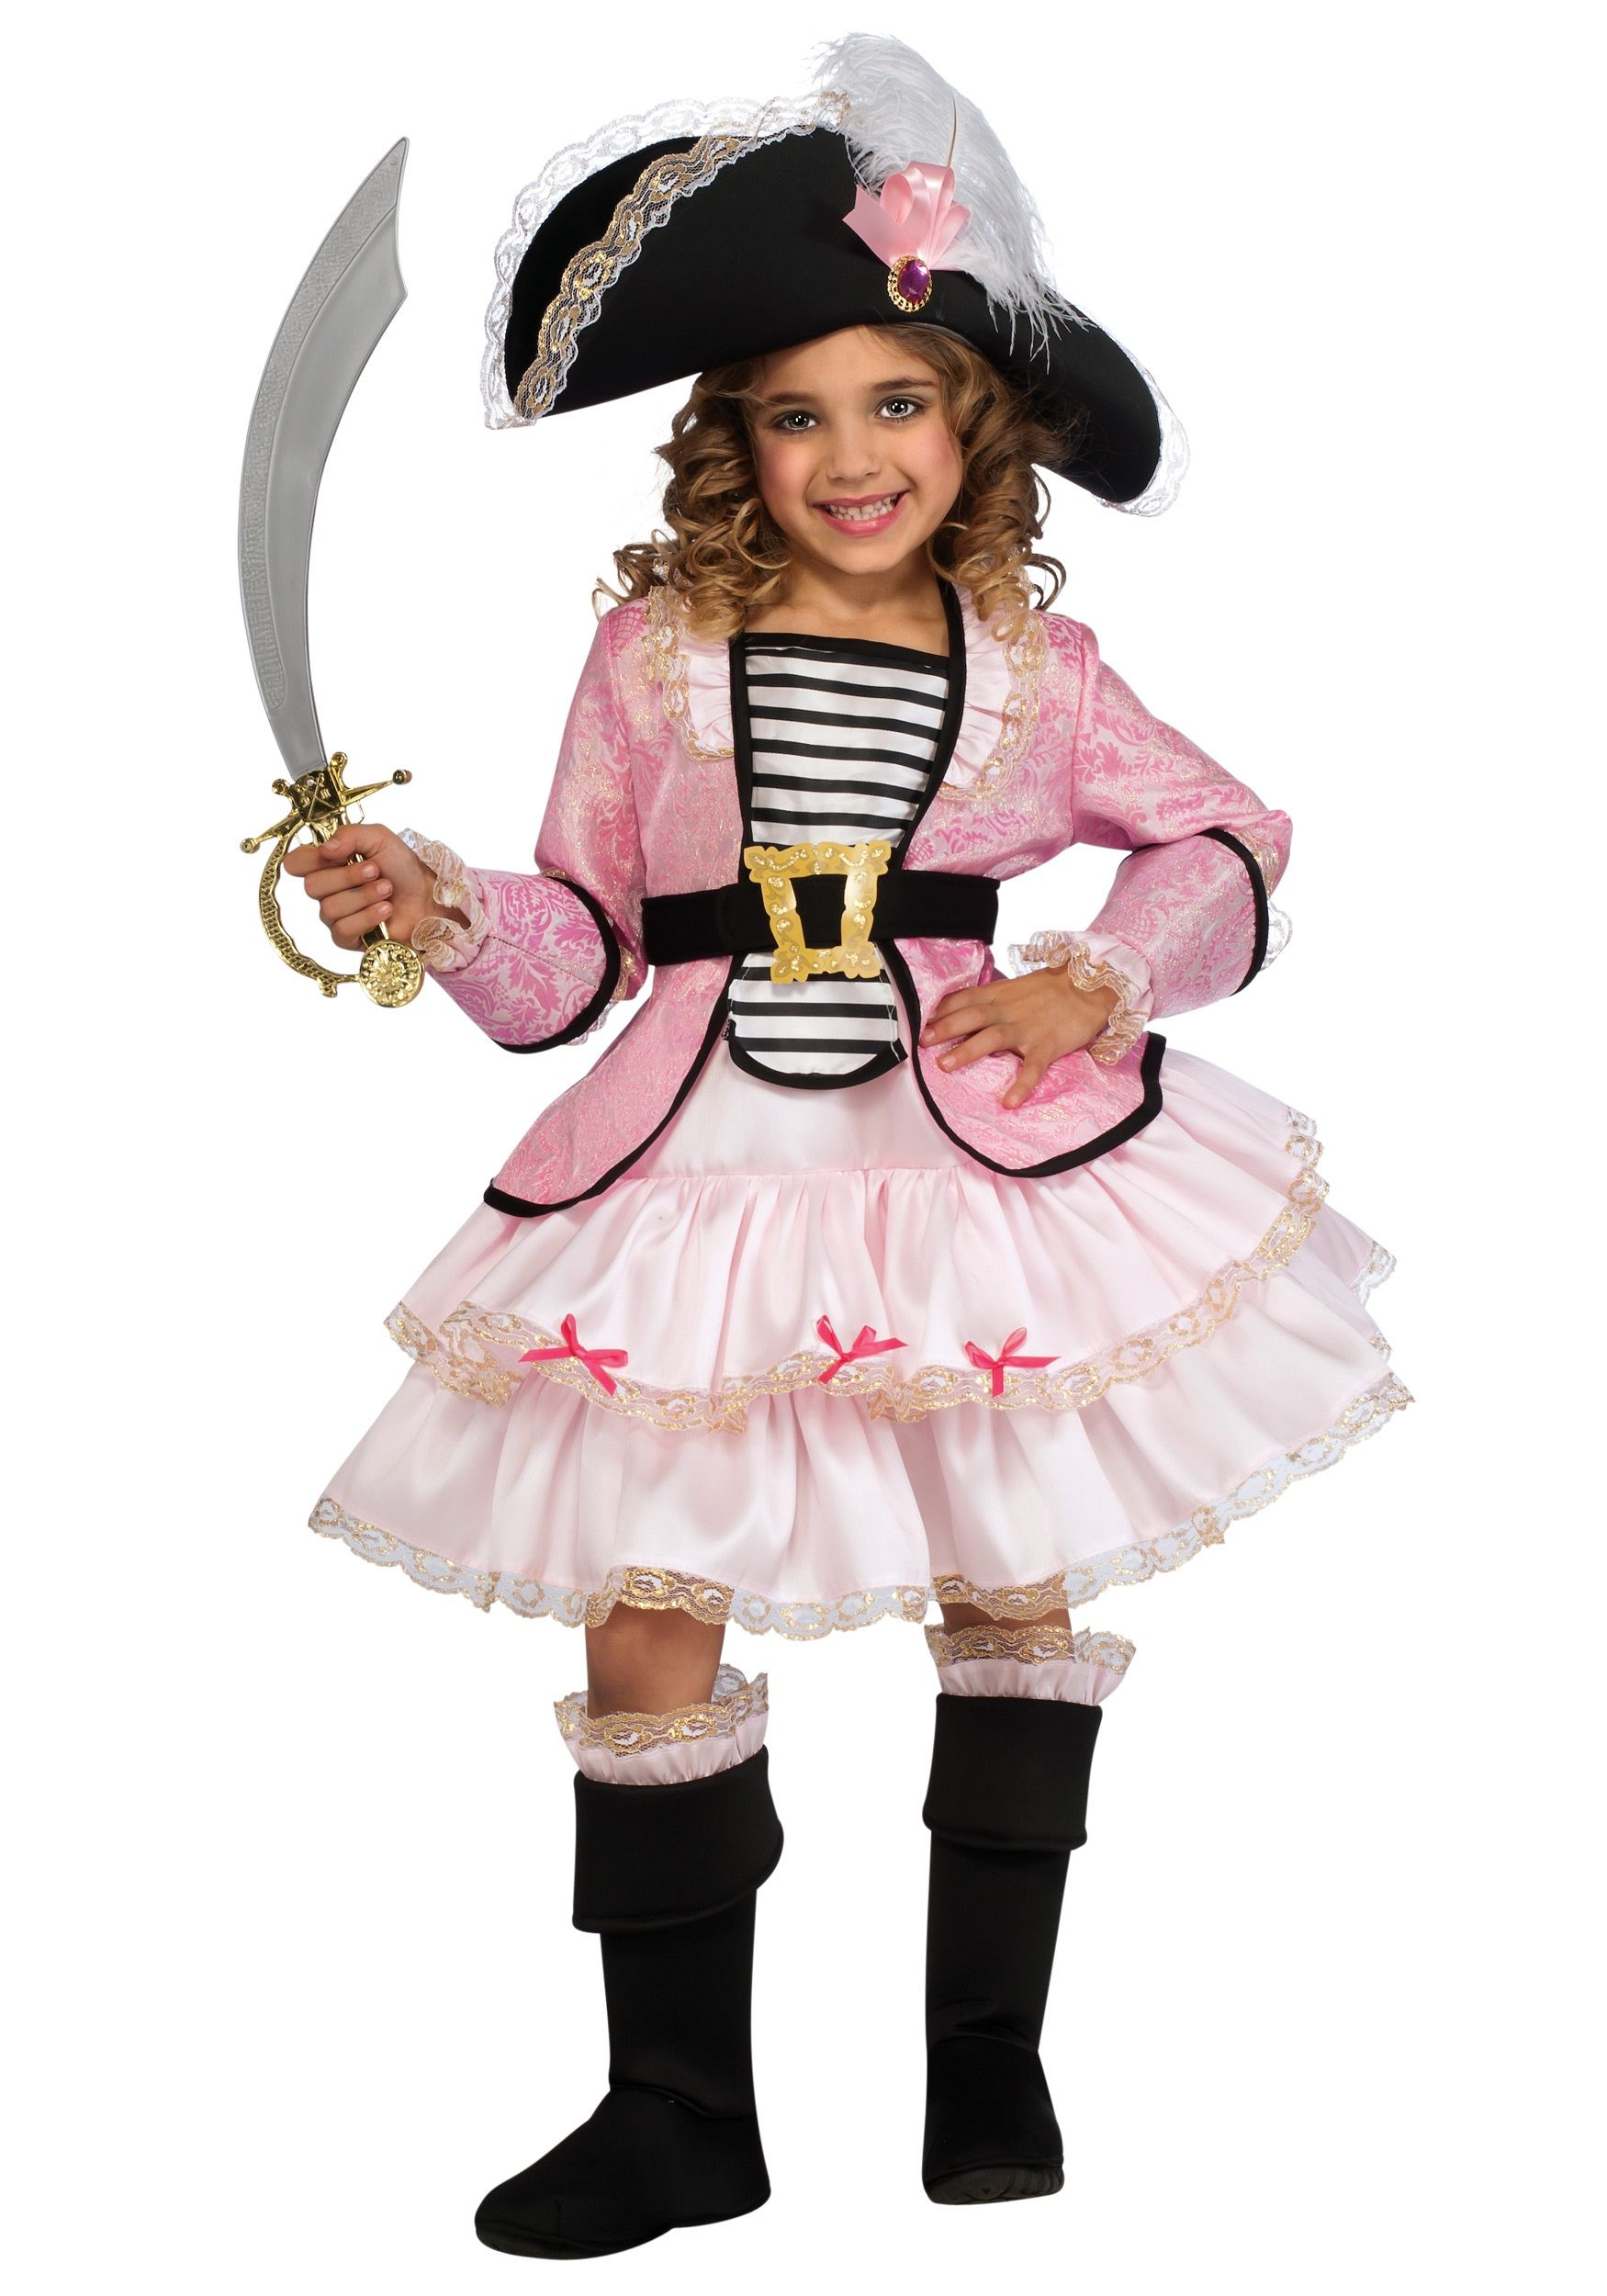 Girls Pirate Princess Costume | Pirate princess costumes ...